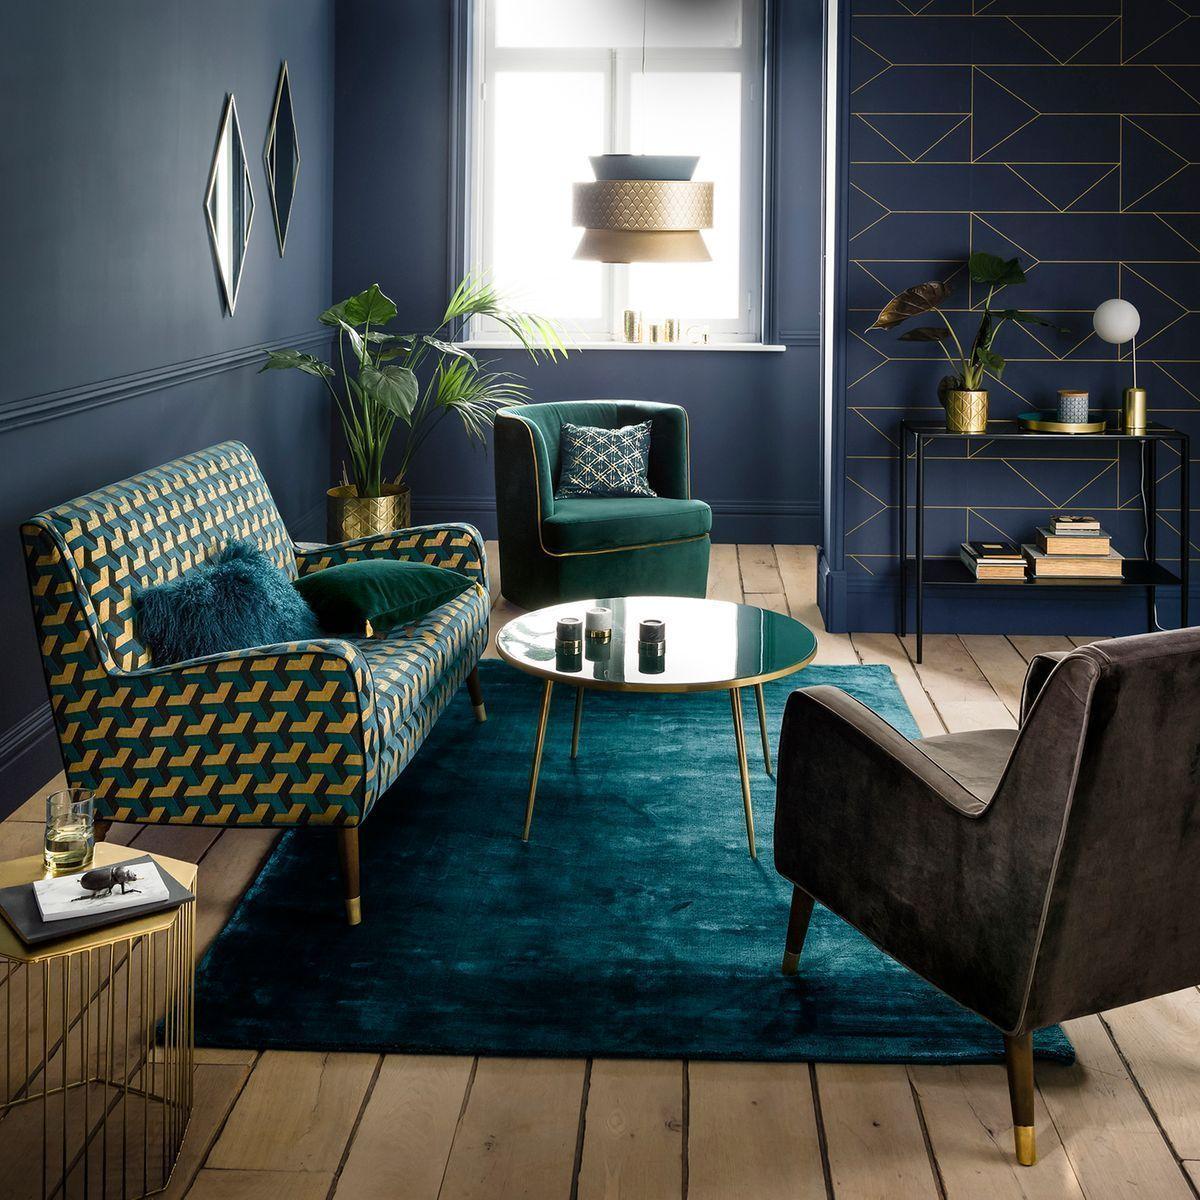 Salon Art Déco dans les Tons Bleu Canard - #canard #salon - #HomeDecoratingIdeas